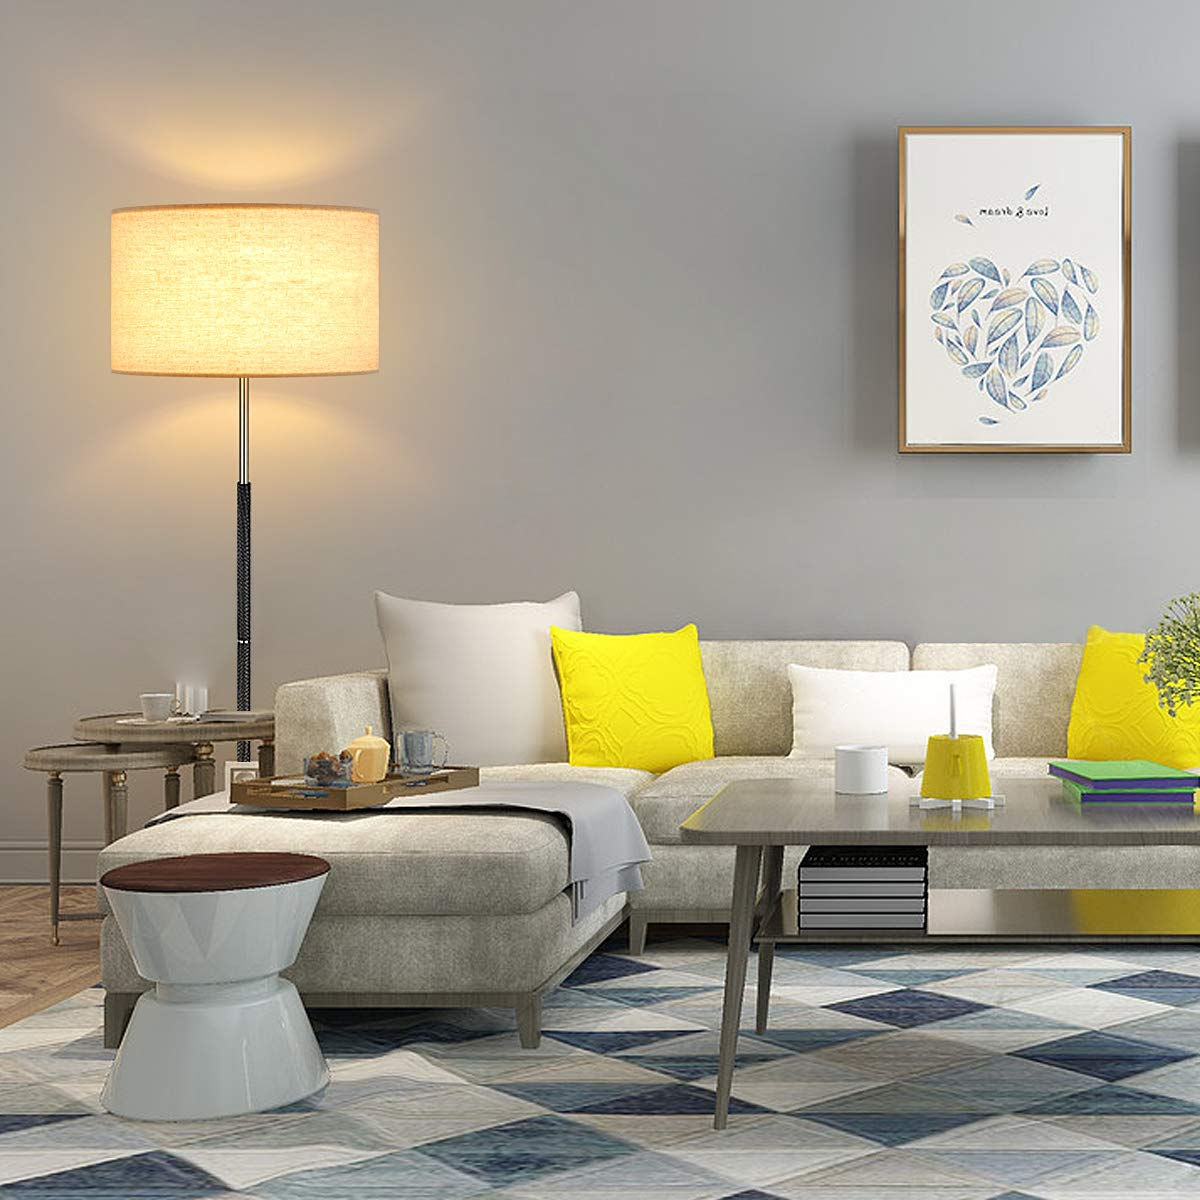 Oneach Belron Modern LED Floor Lamp